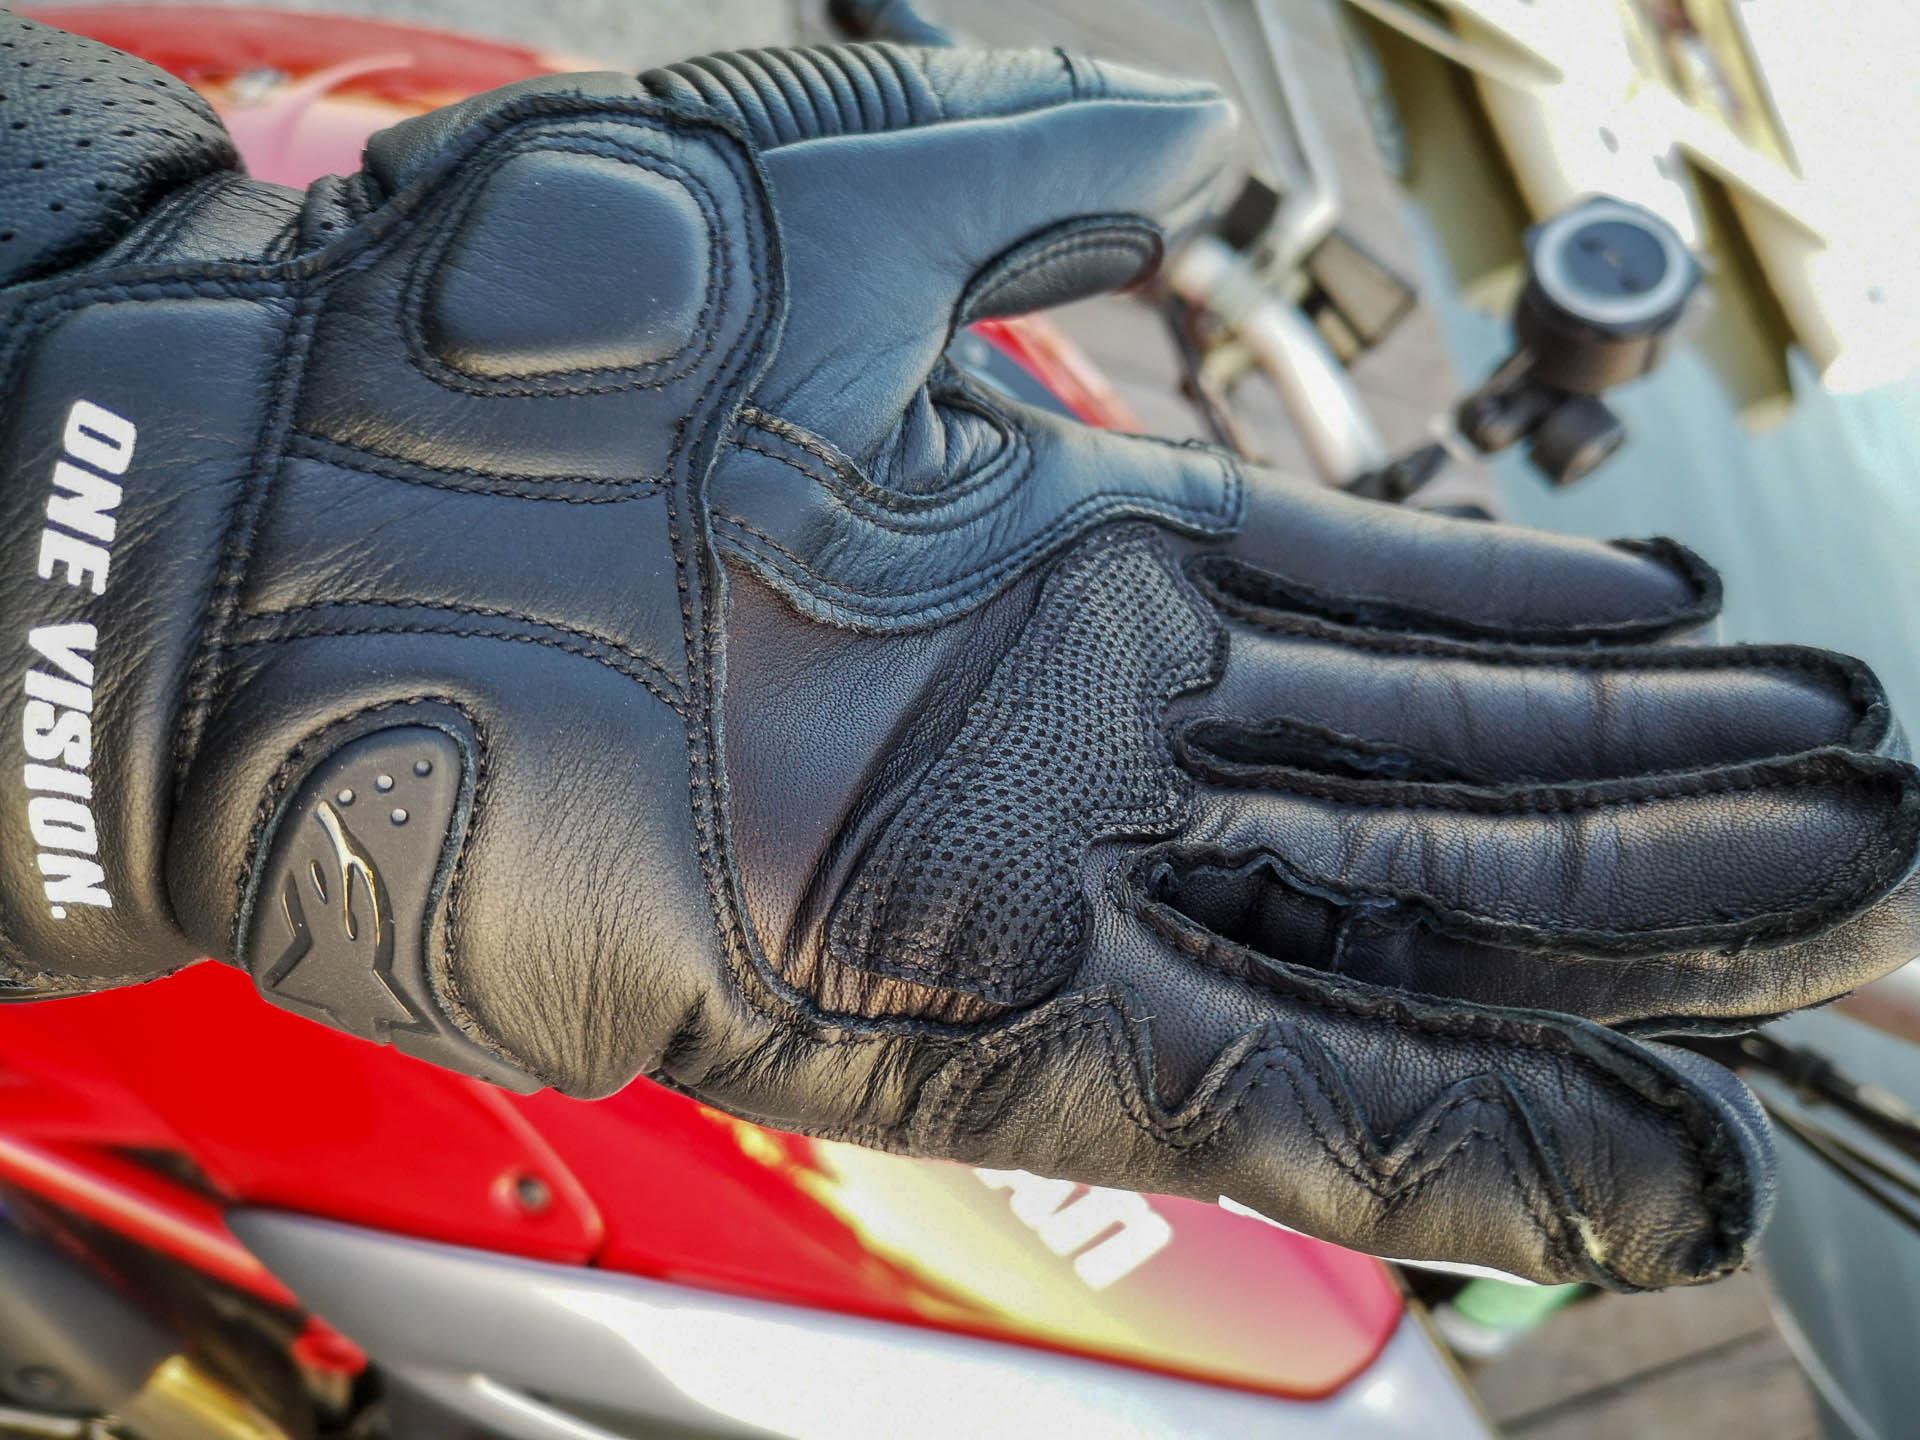 Empaumure renforcée sur les gants racing AlpineStars GP Pro